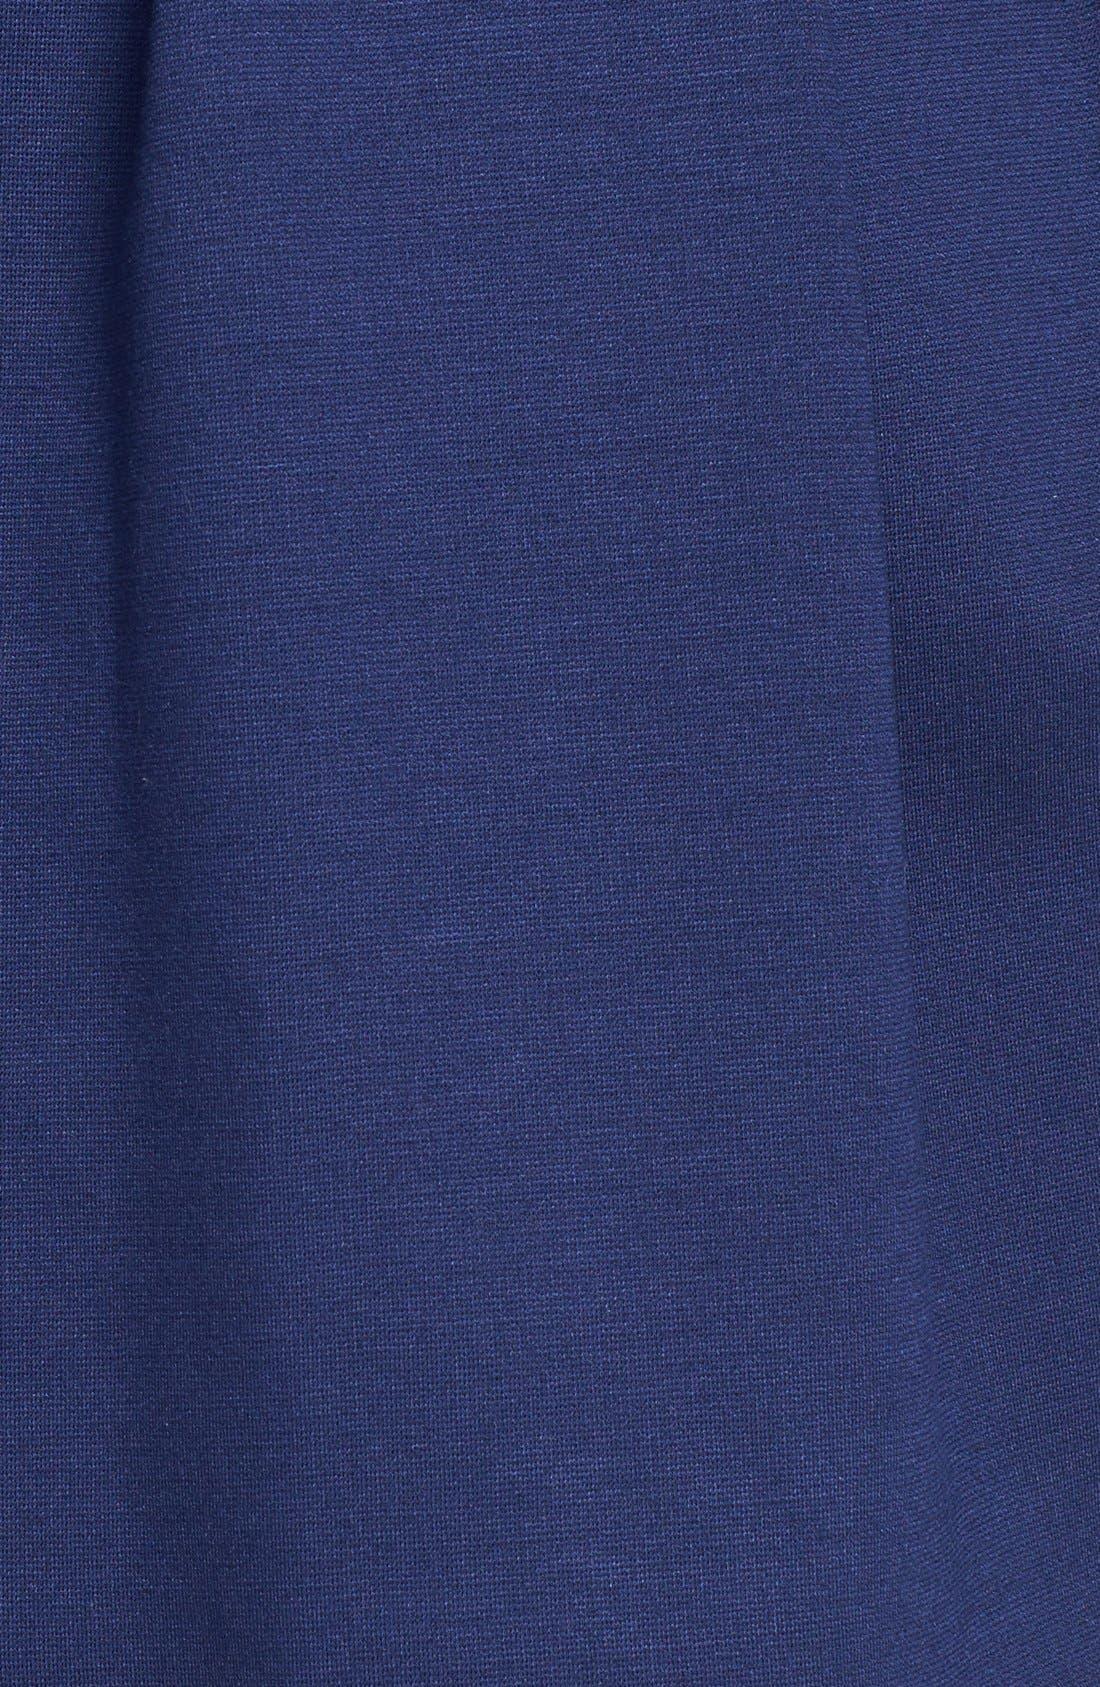 Alternate Image 4  - Black Swan Cap Sleeve Ponte Knit Fit & Flare Dress